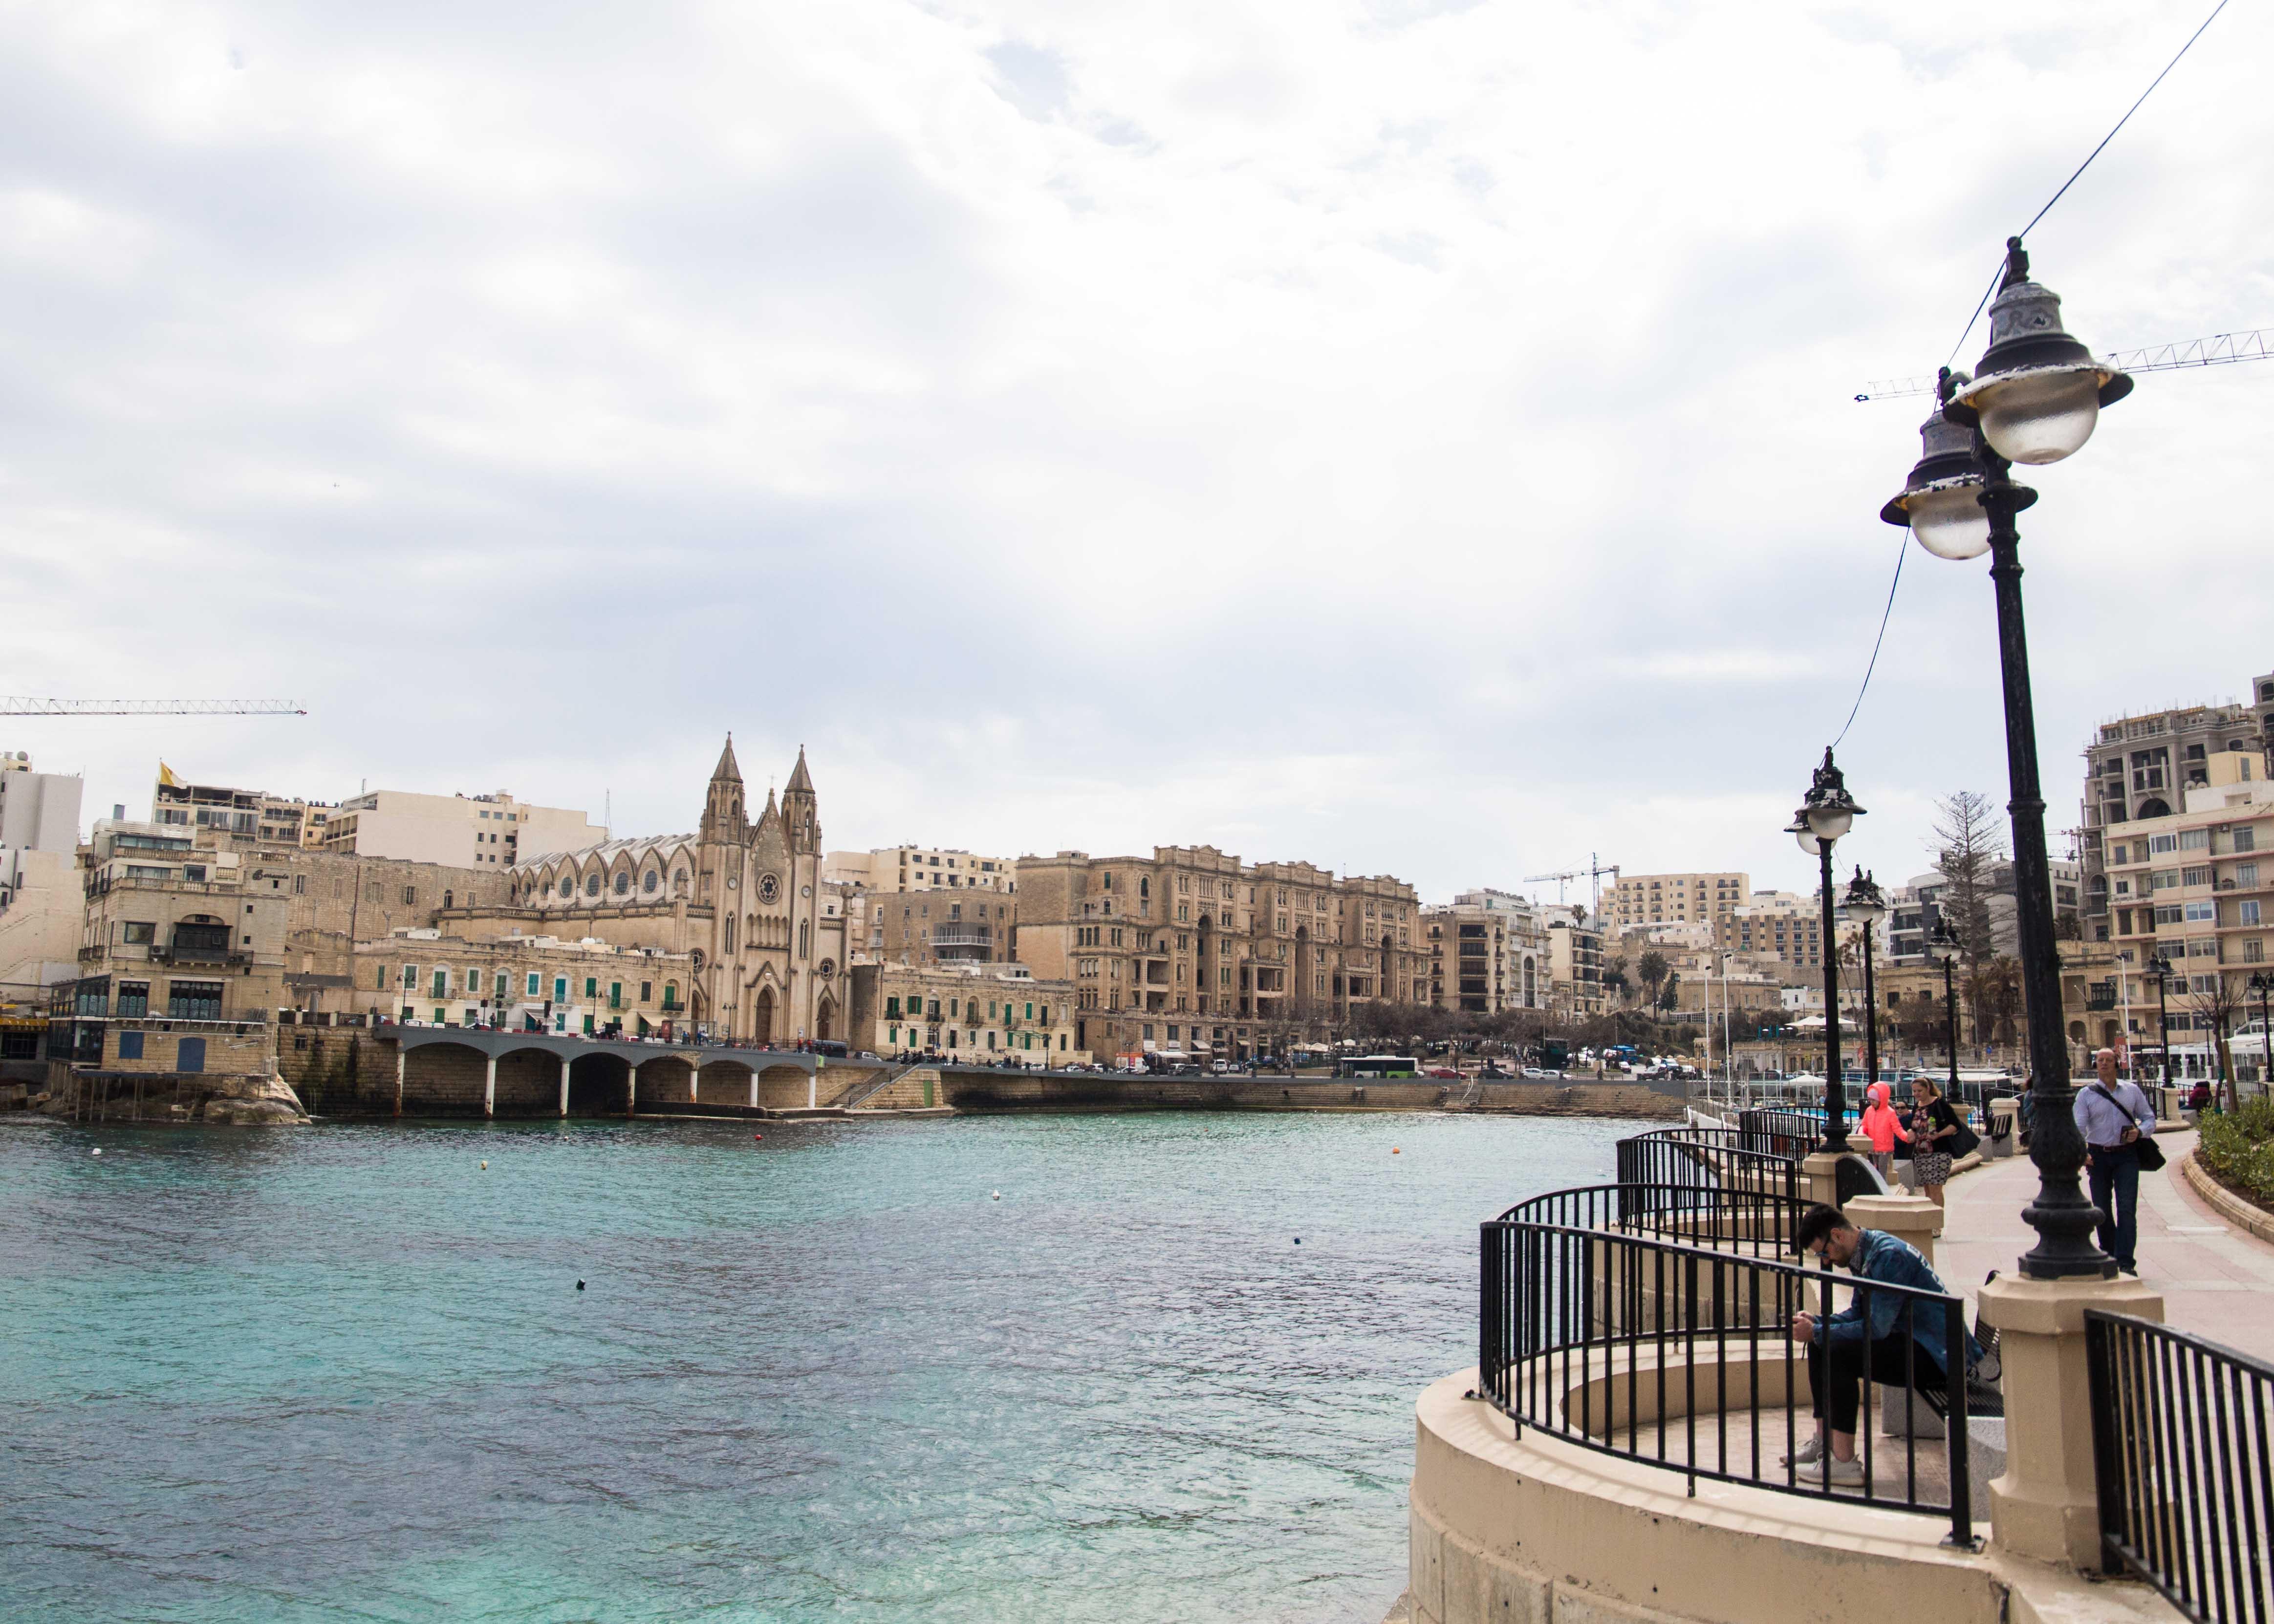 Where to visit in Malta? St. Julian's Bay